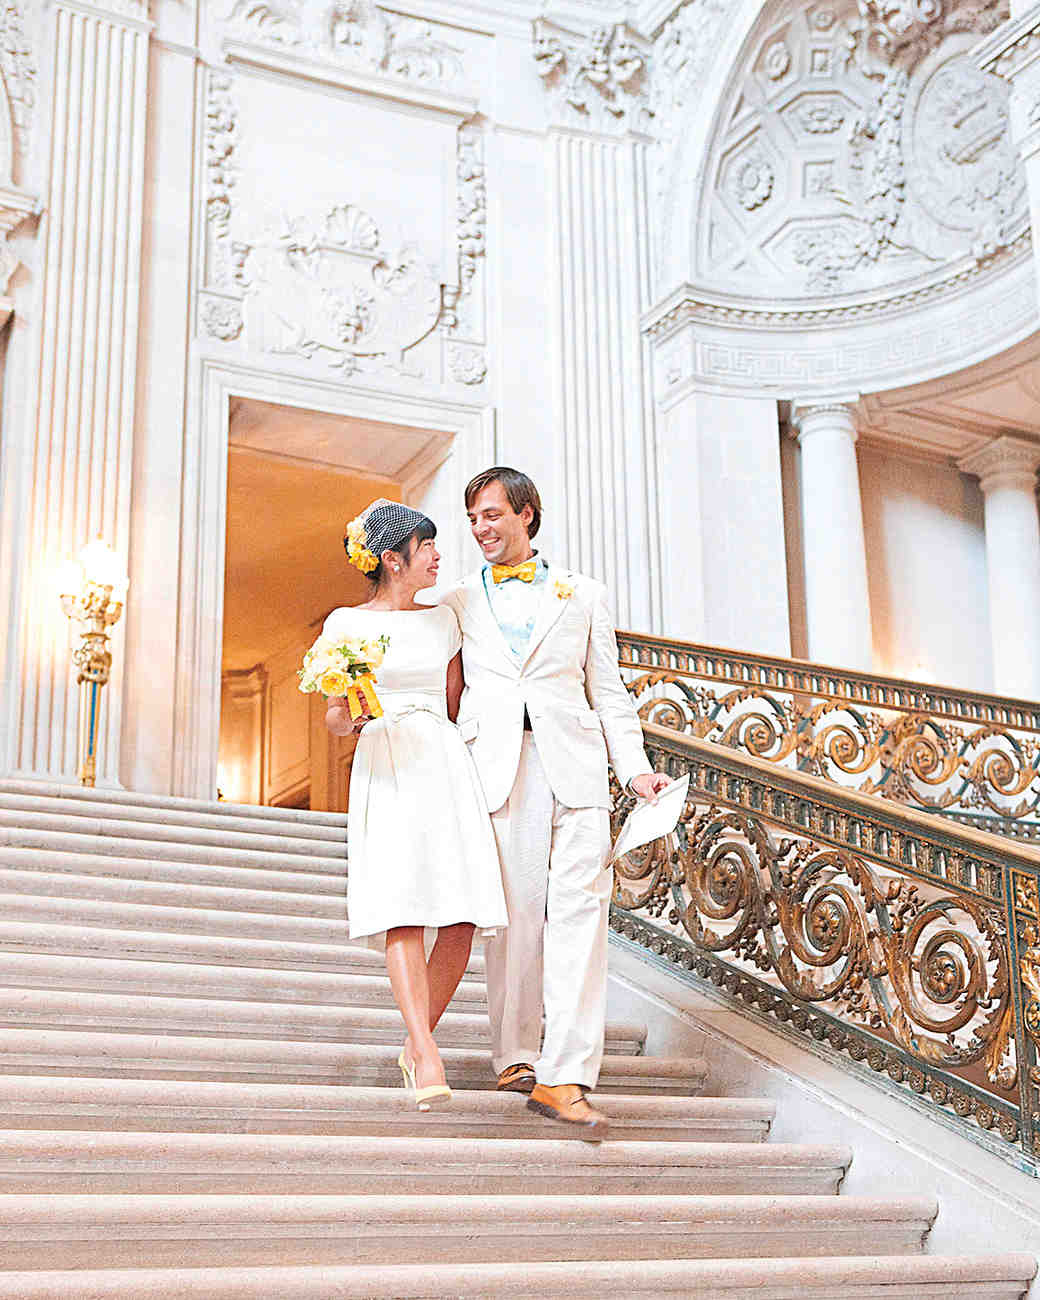 filming-locations-wedding-venues-sf-city-hall-indiana-jones-mwd104950-0215.jpg